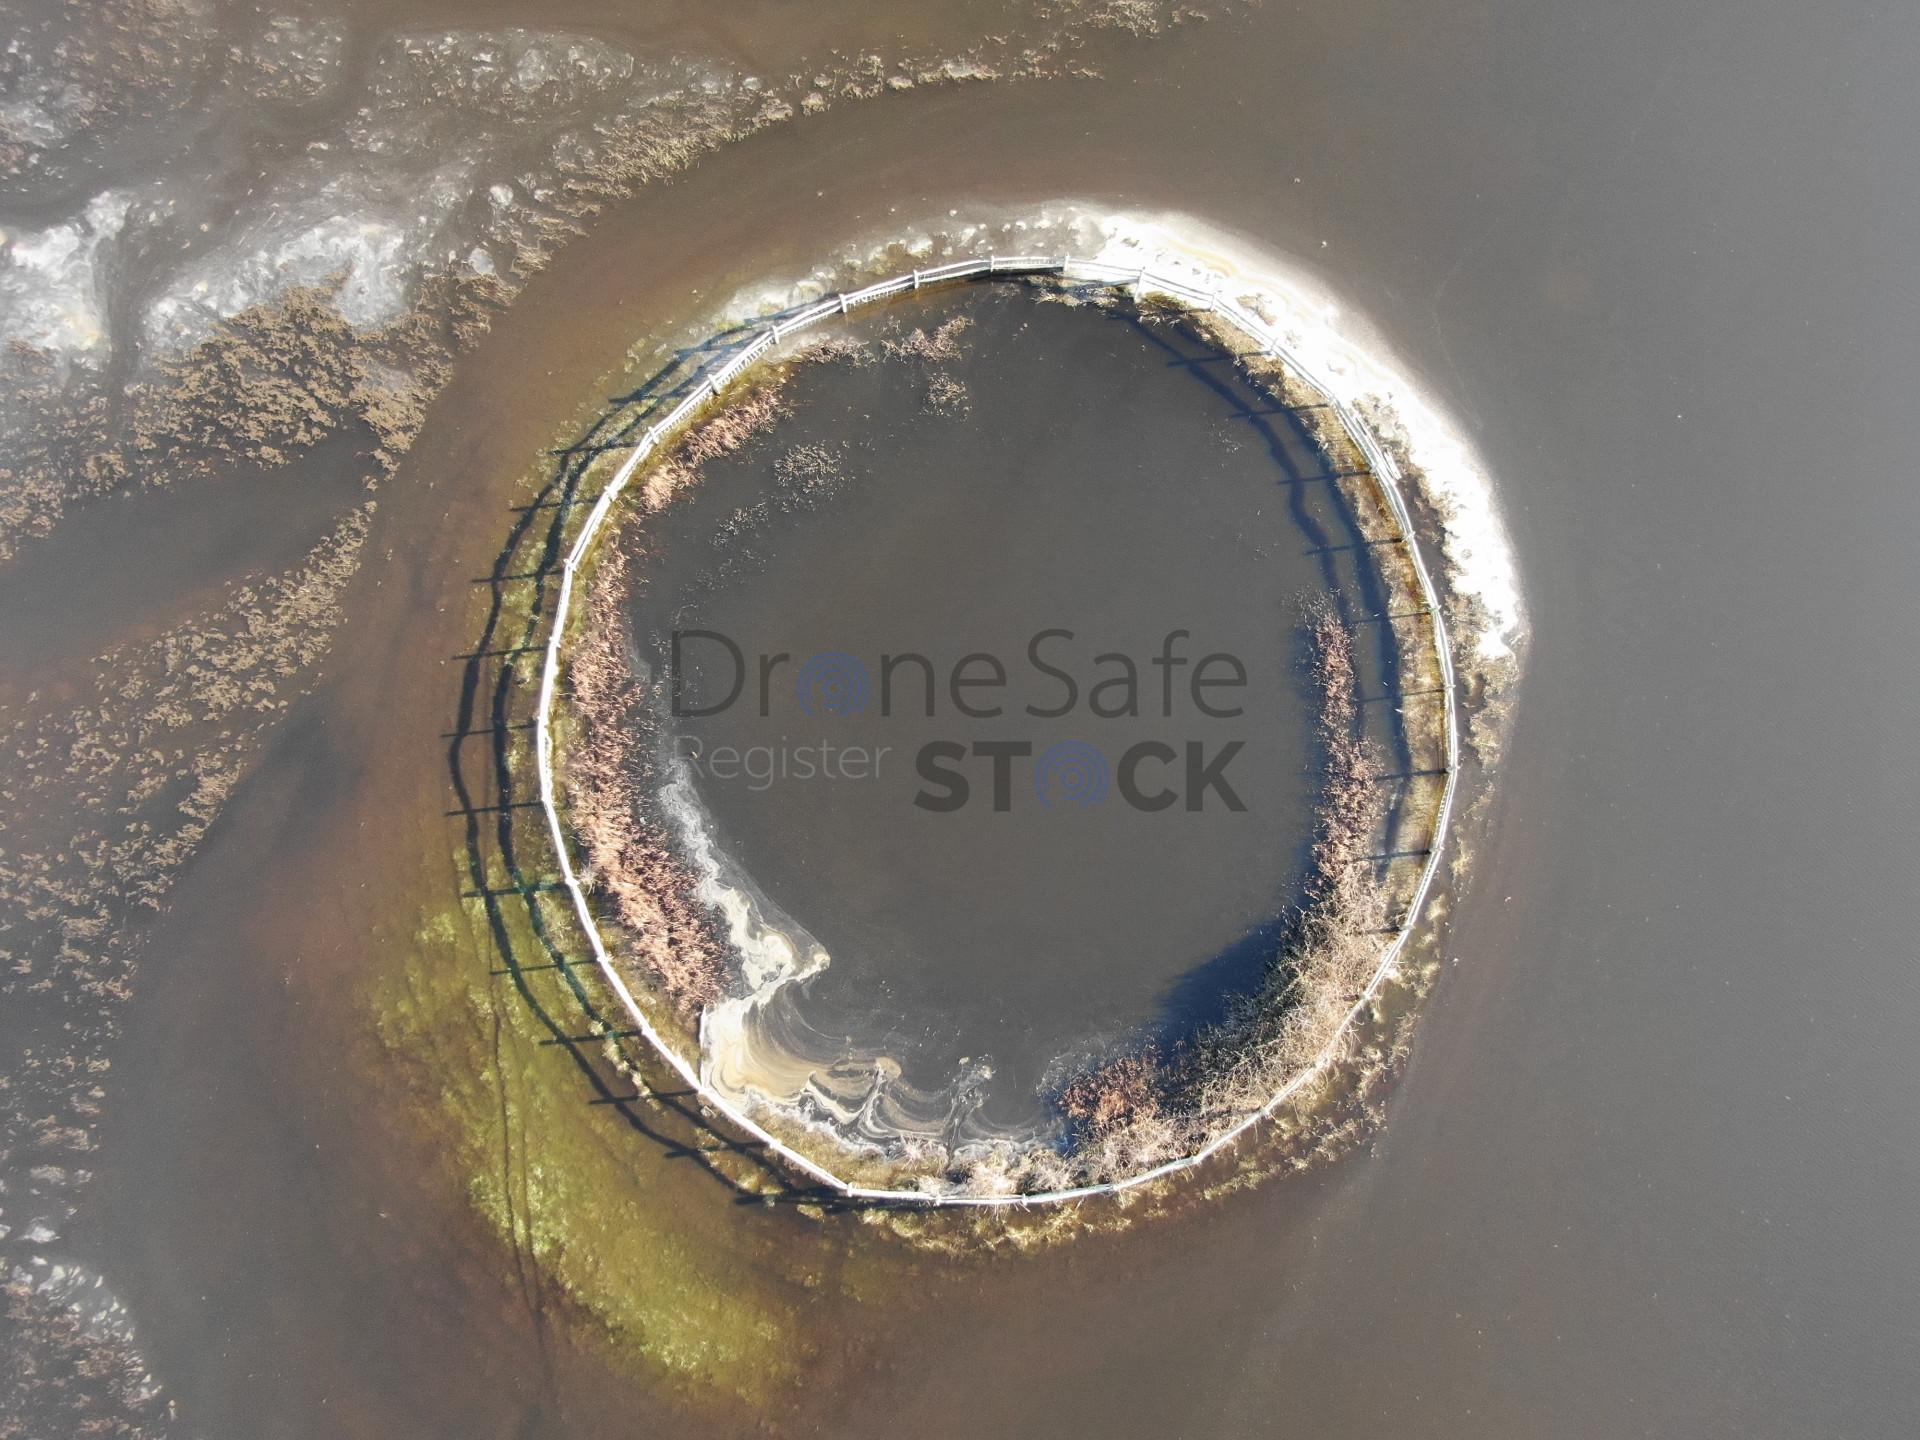 Dronesview Imaging Ltd